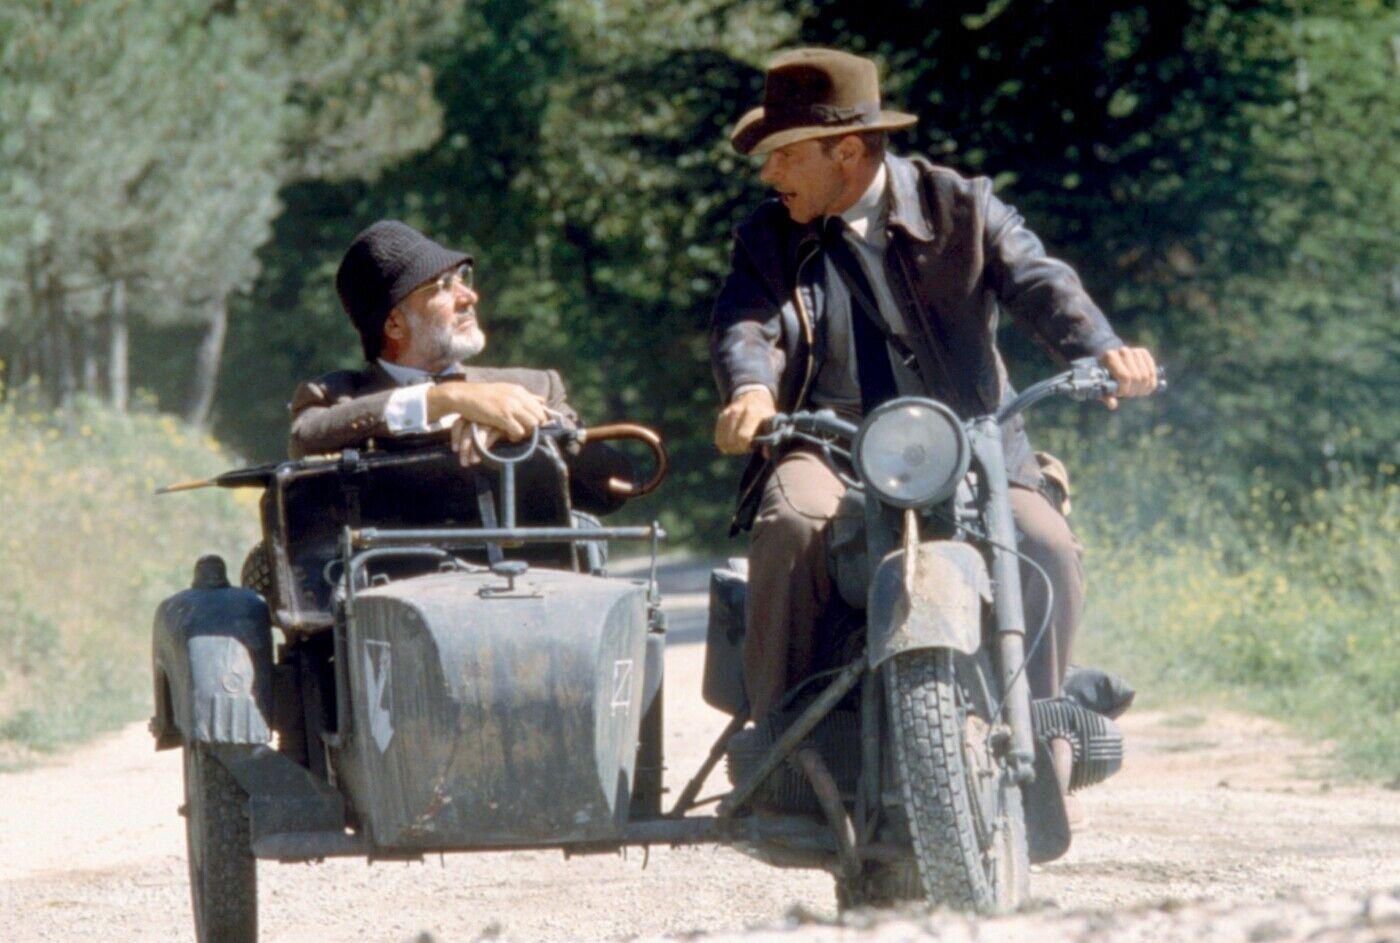 Харрисон Форд и сер Шон Коннери на киевском мотоцикле.